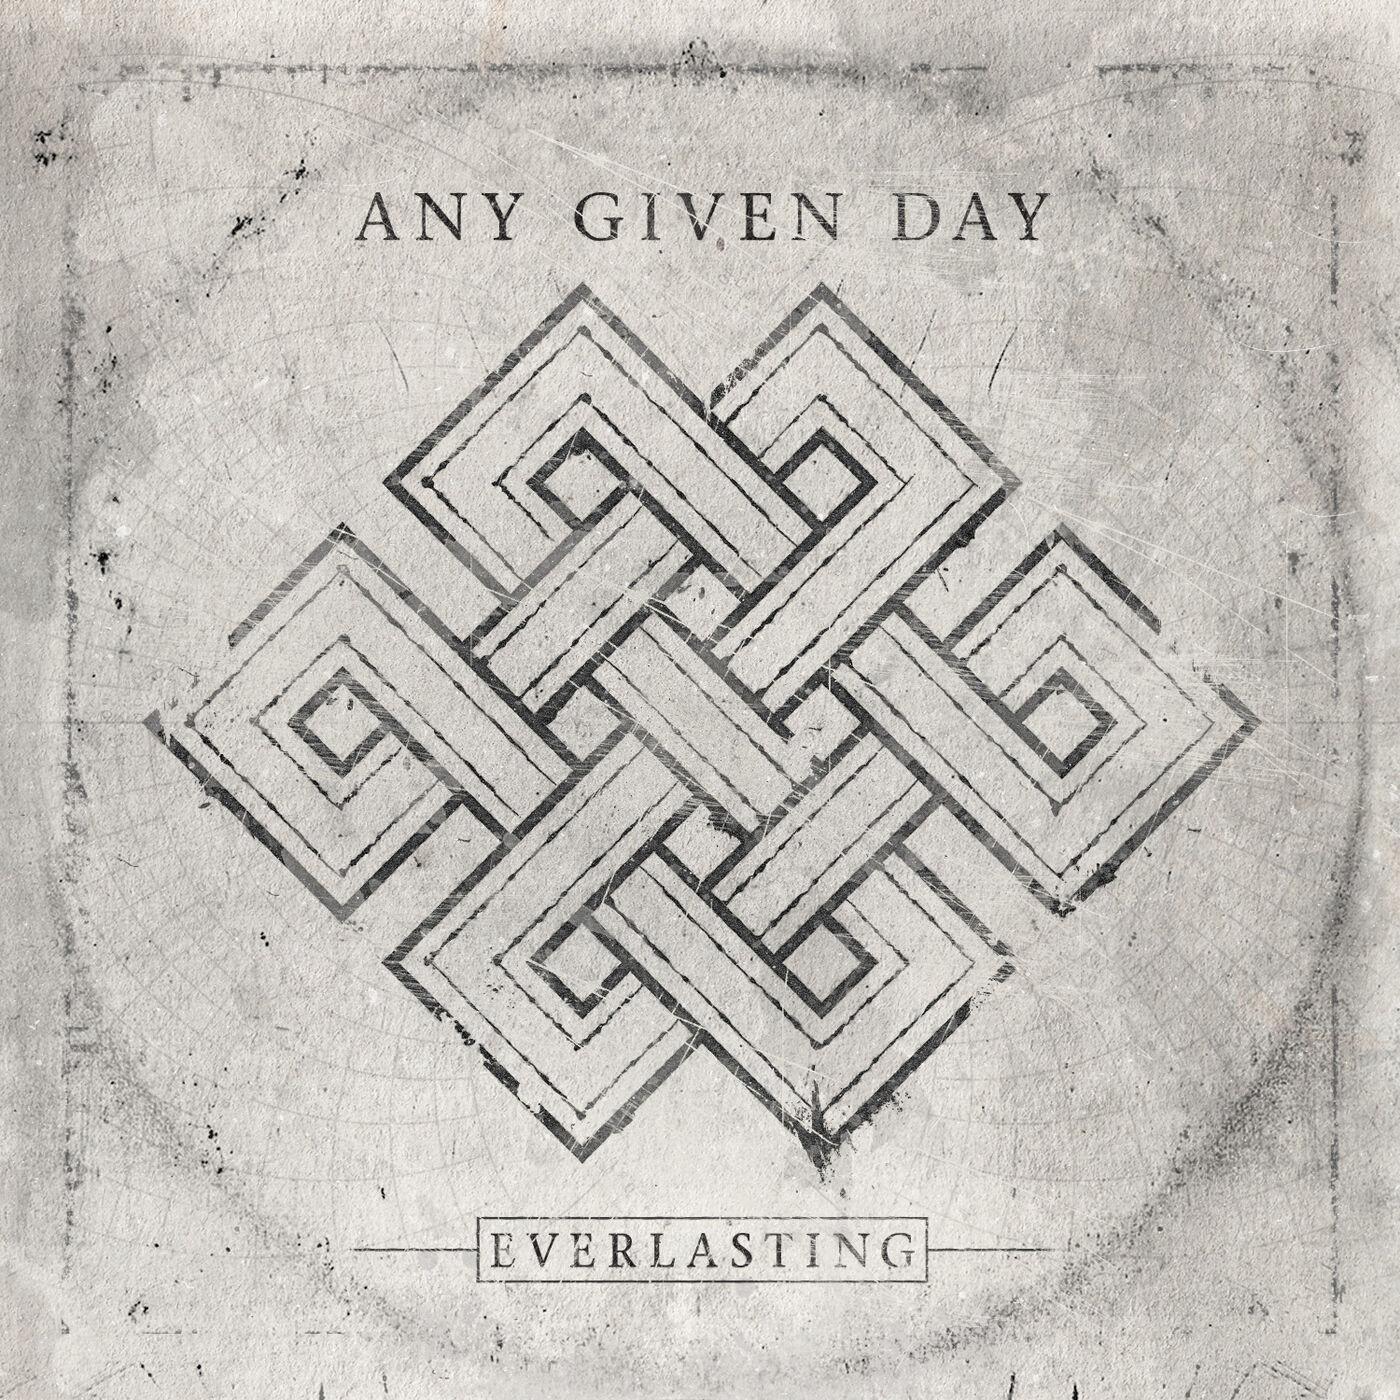 Any Given Day - Endurance [single] (2016)